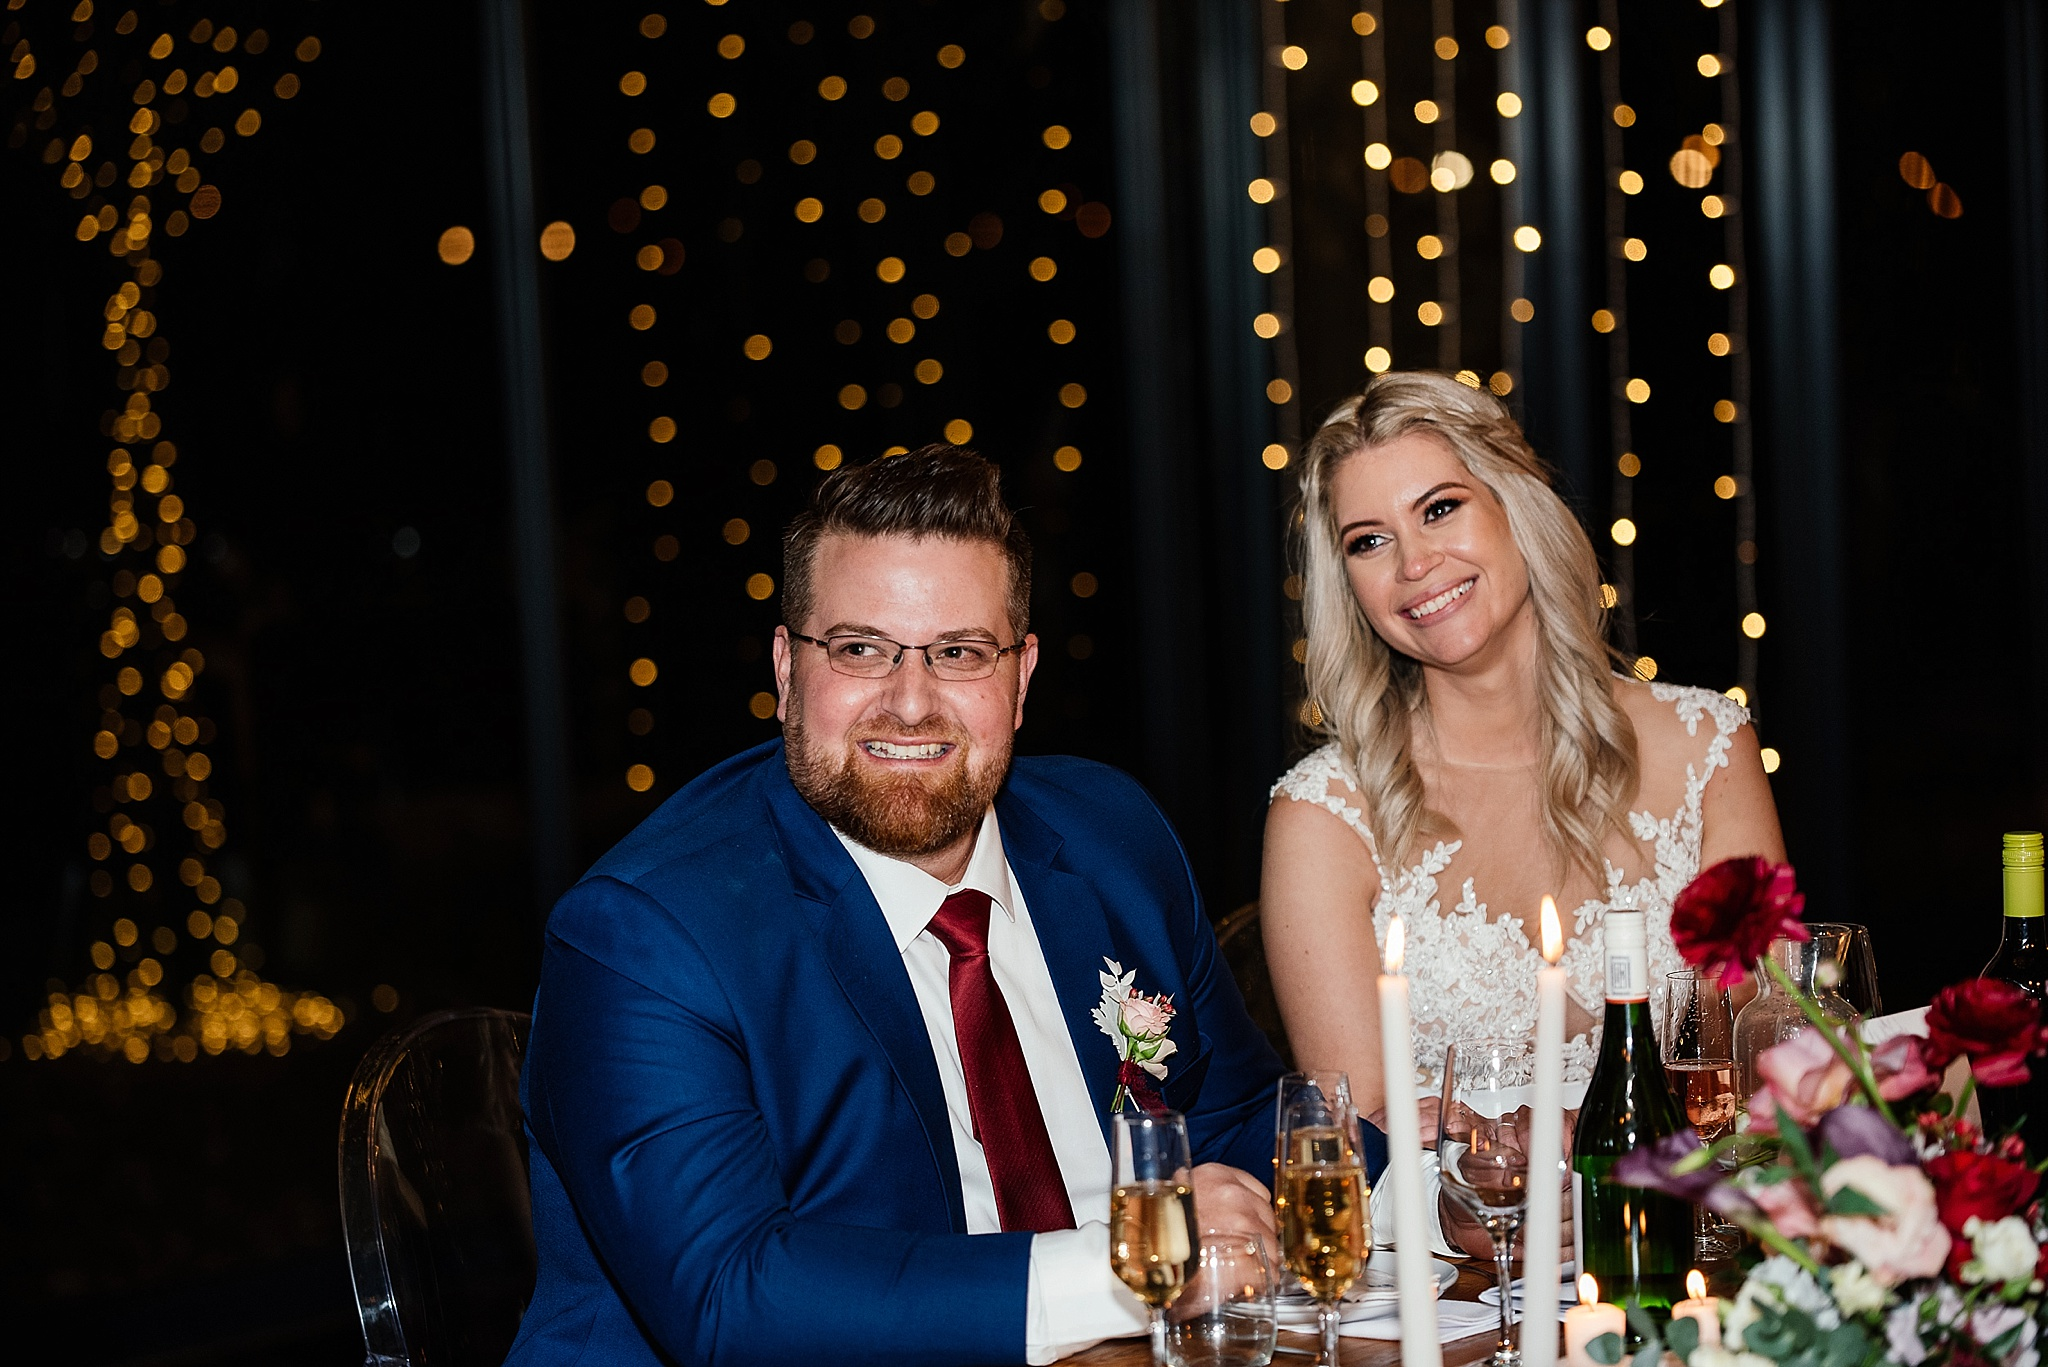 Cape Town Photographer Darren Bester - Die Woud Wedding - Gareth & Roxanne_0049.jpg